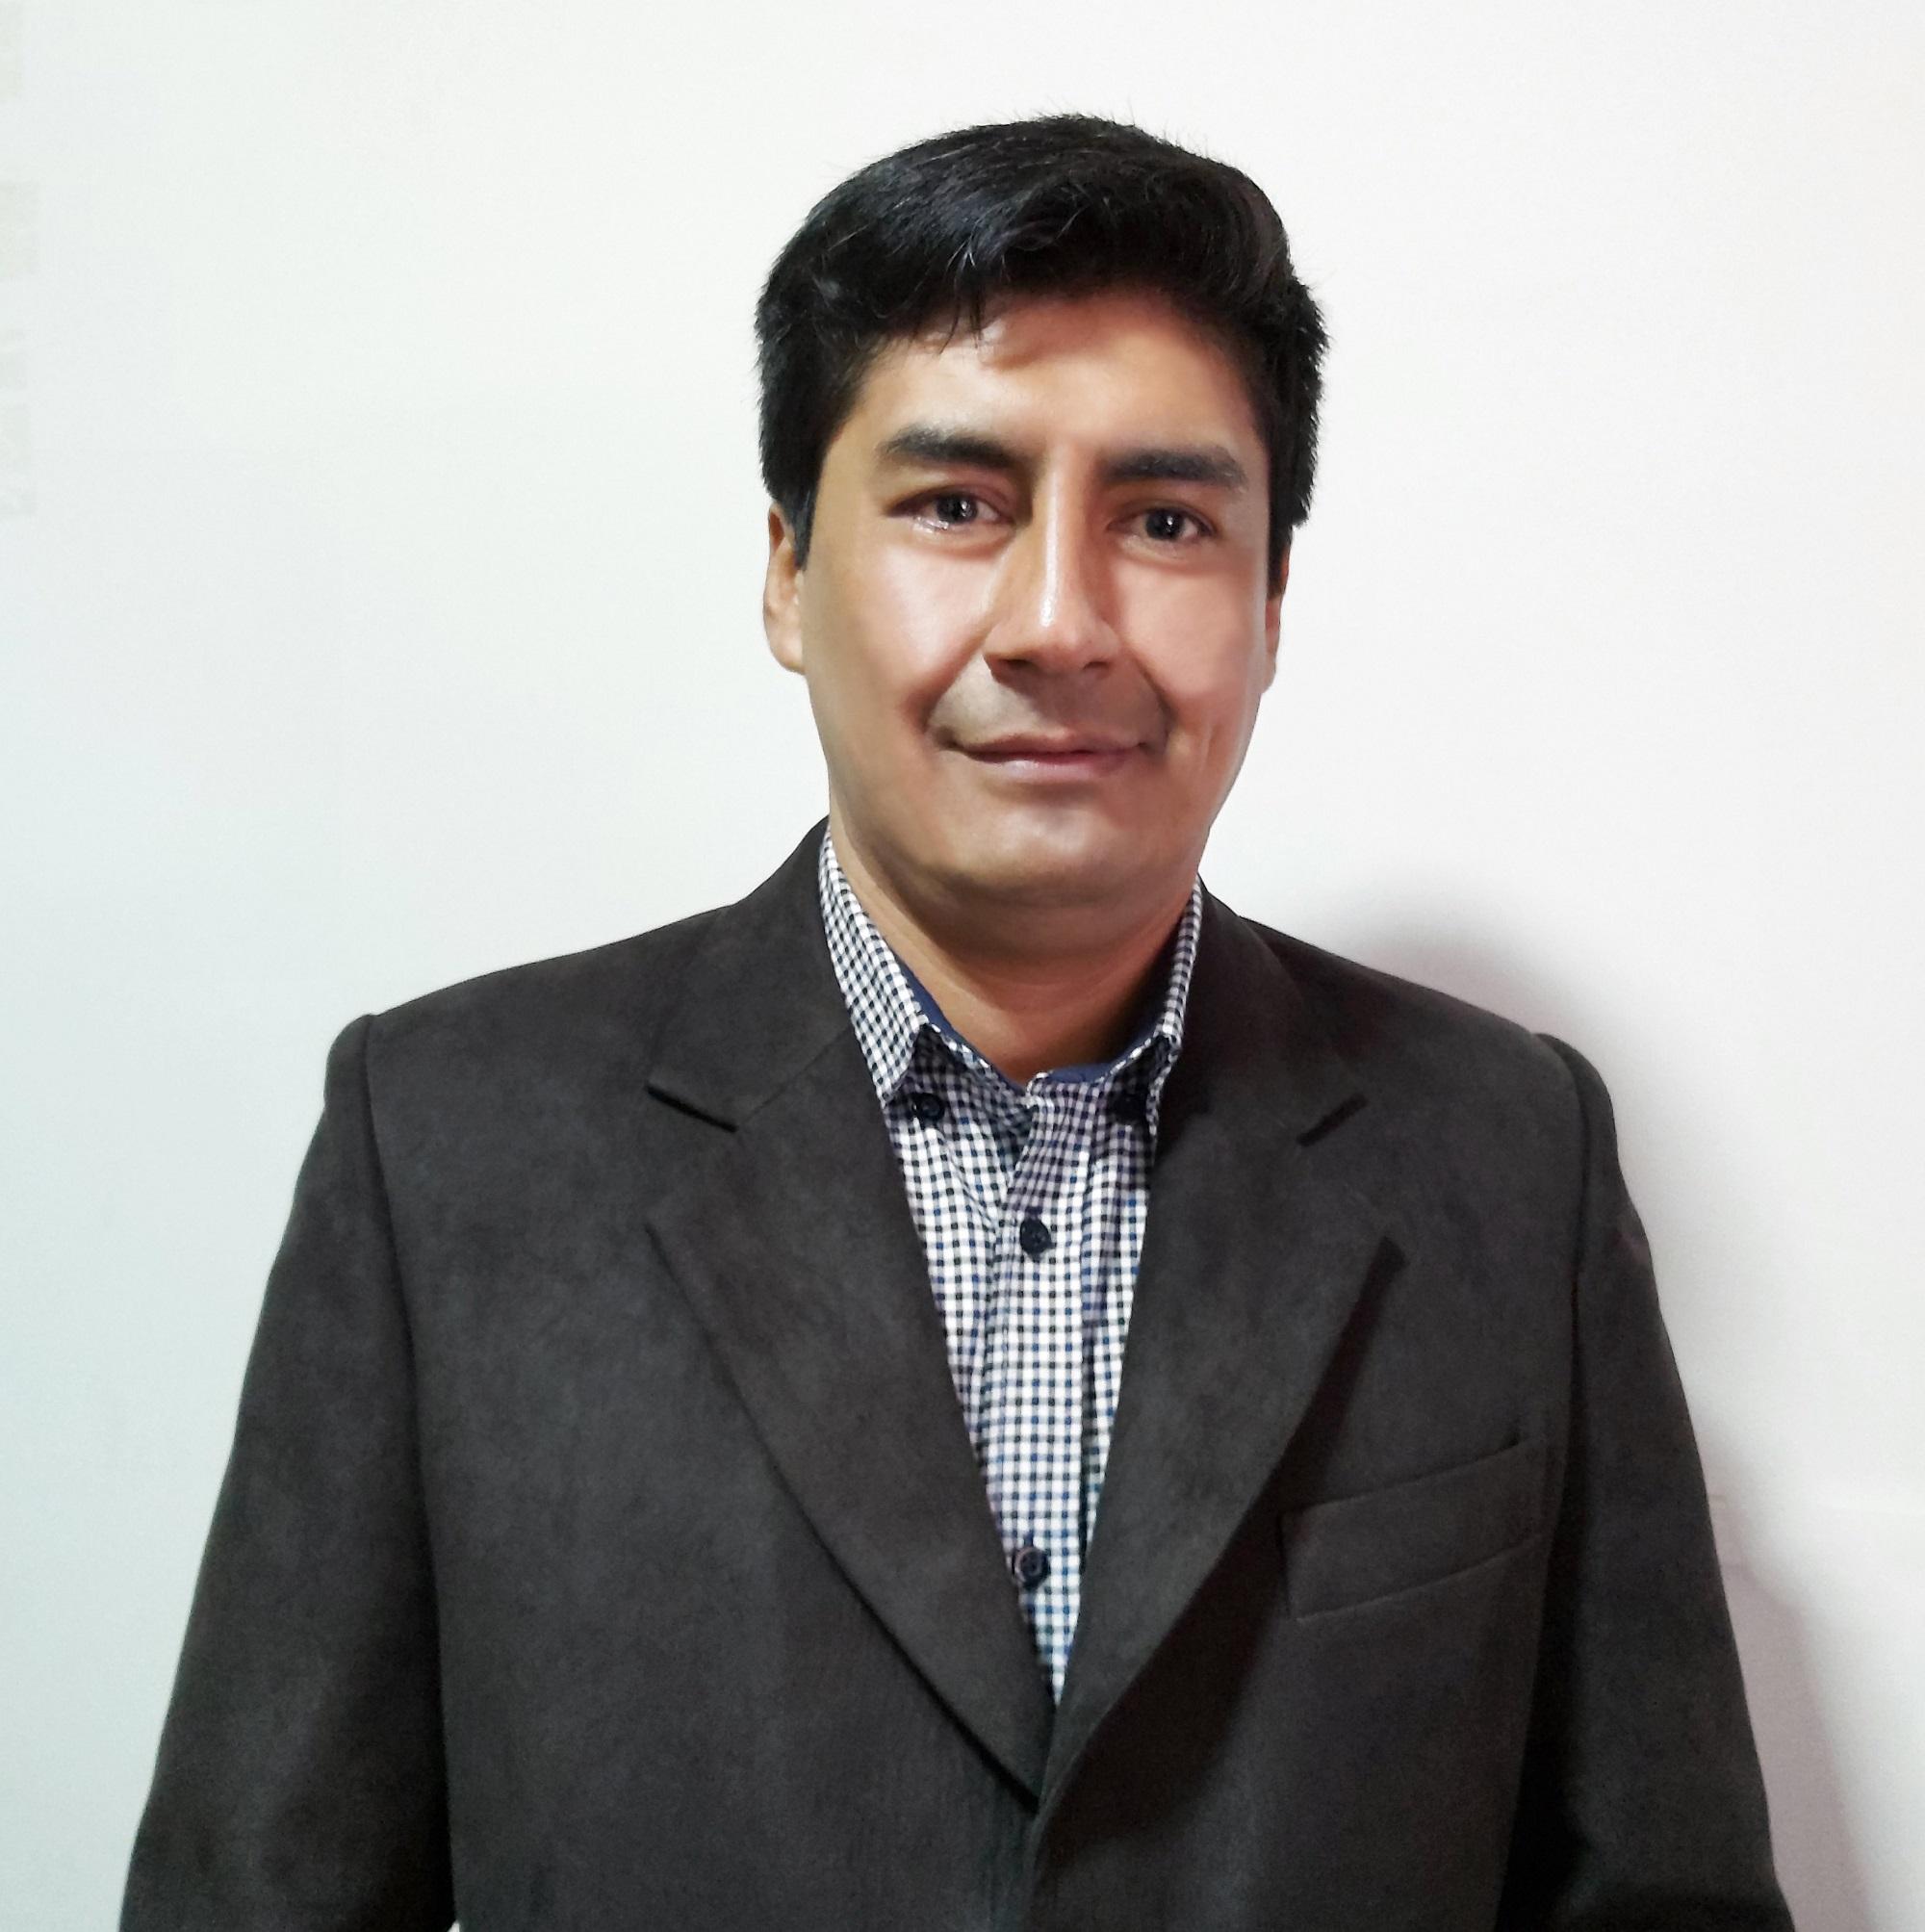 Lic. Andrés Cuevas Ordoñez